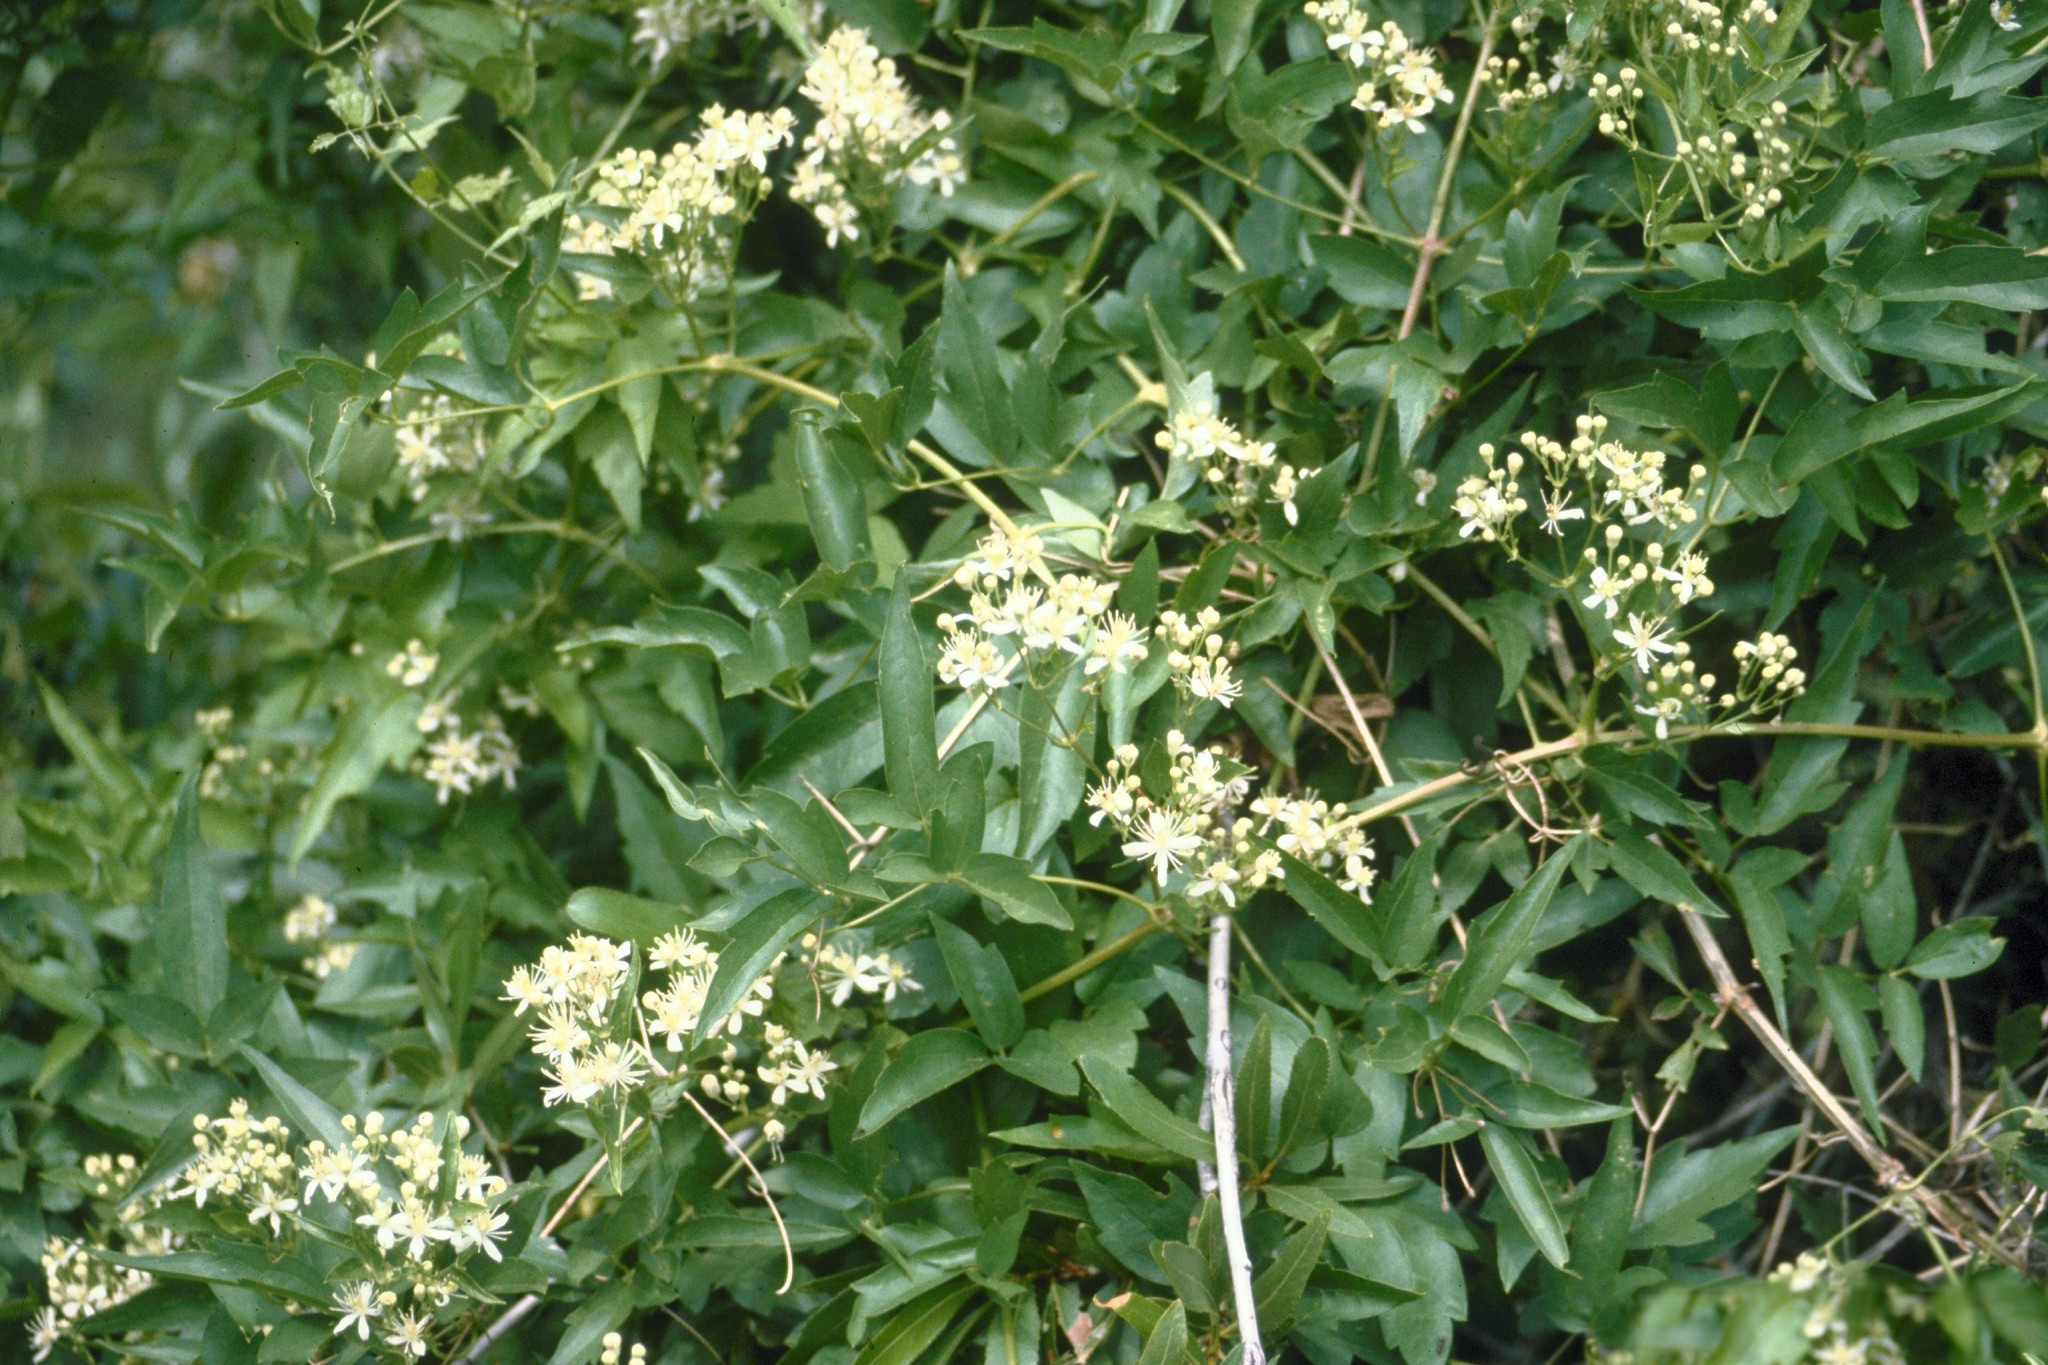 Clematis_ligusticifolia.jpg